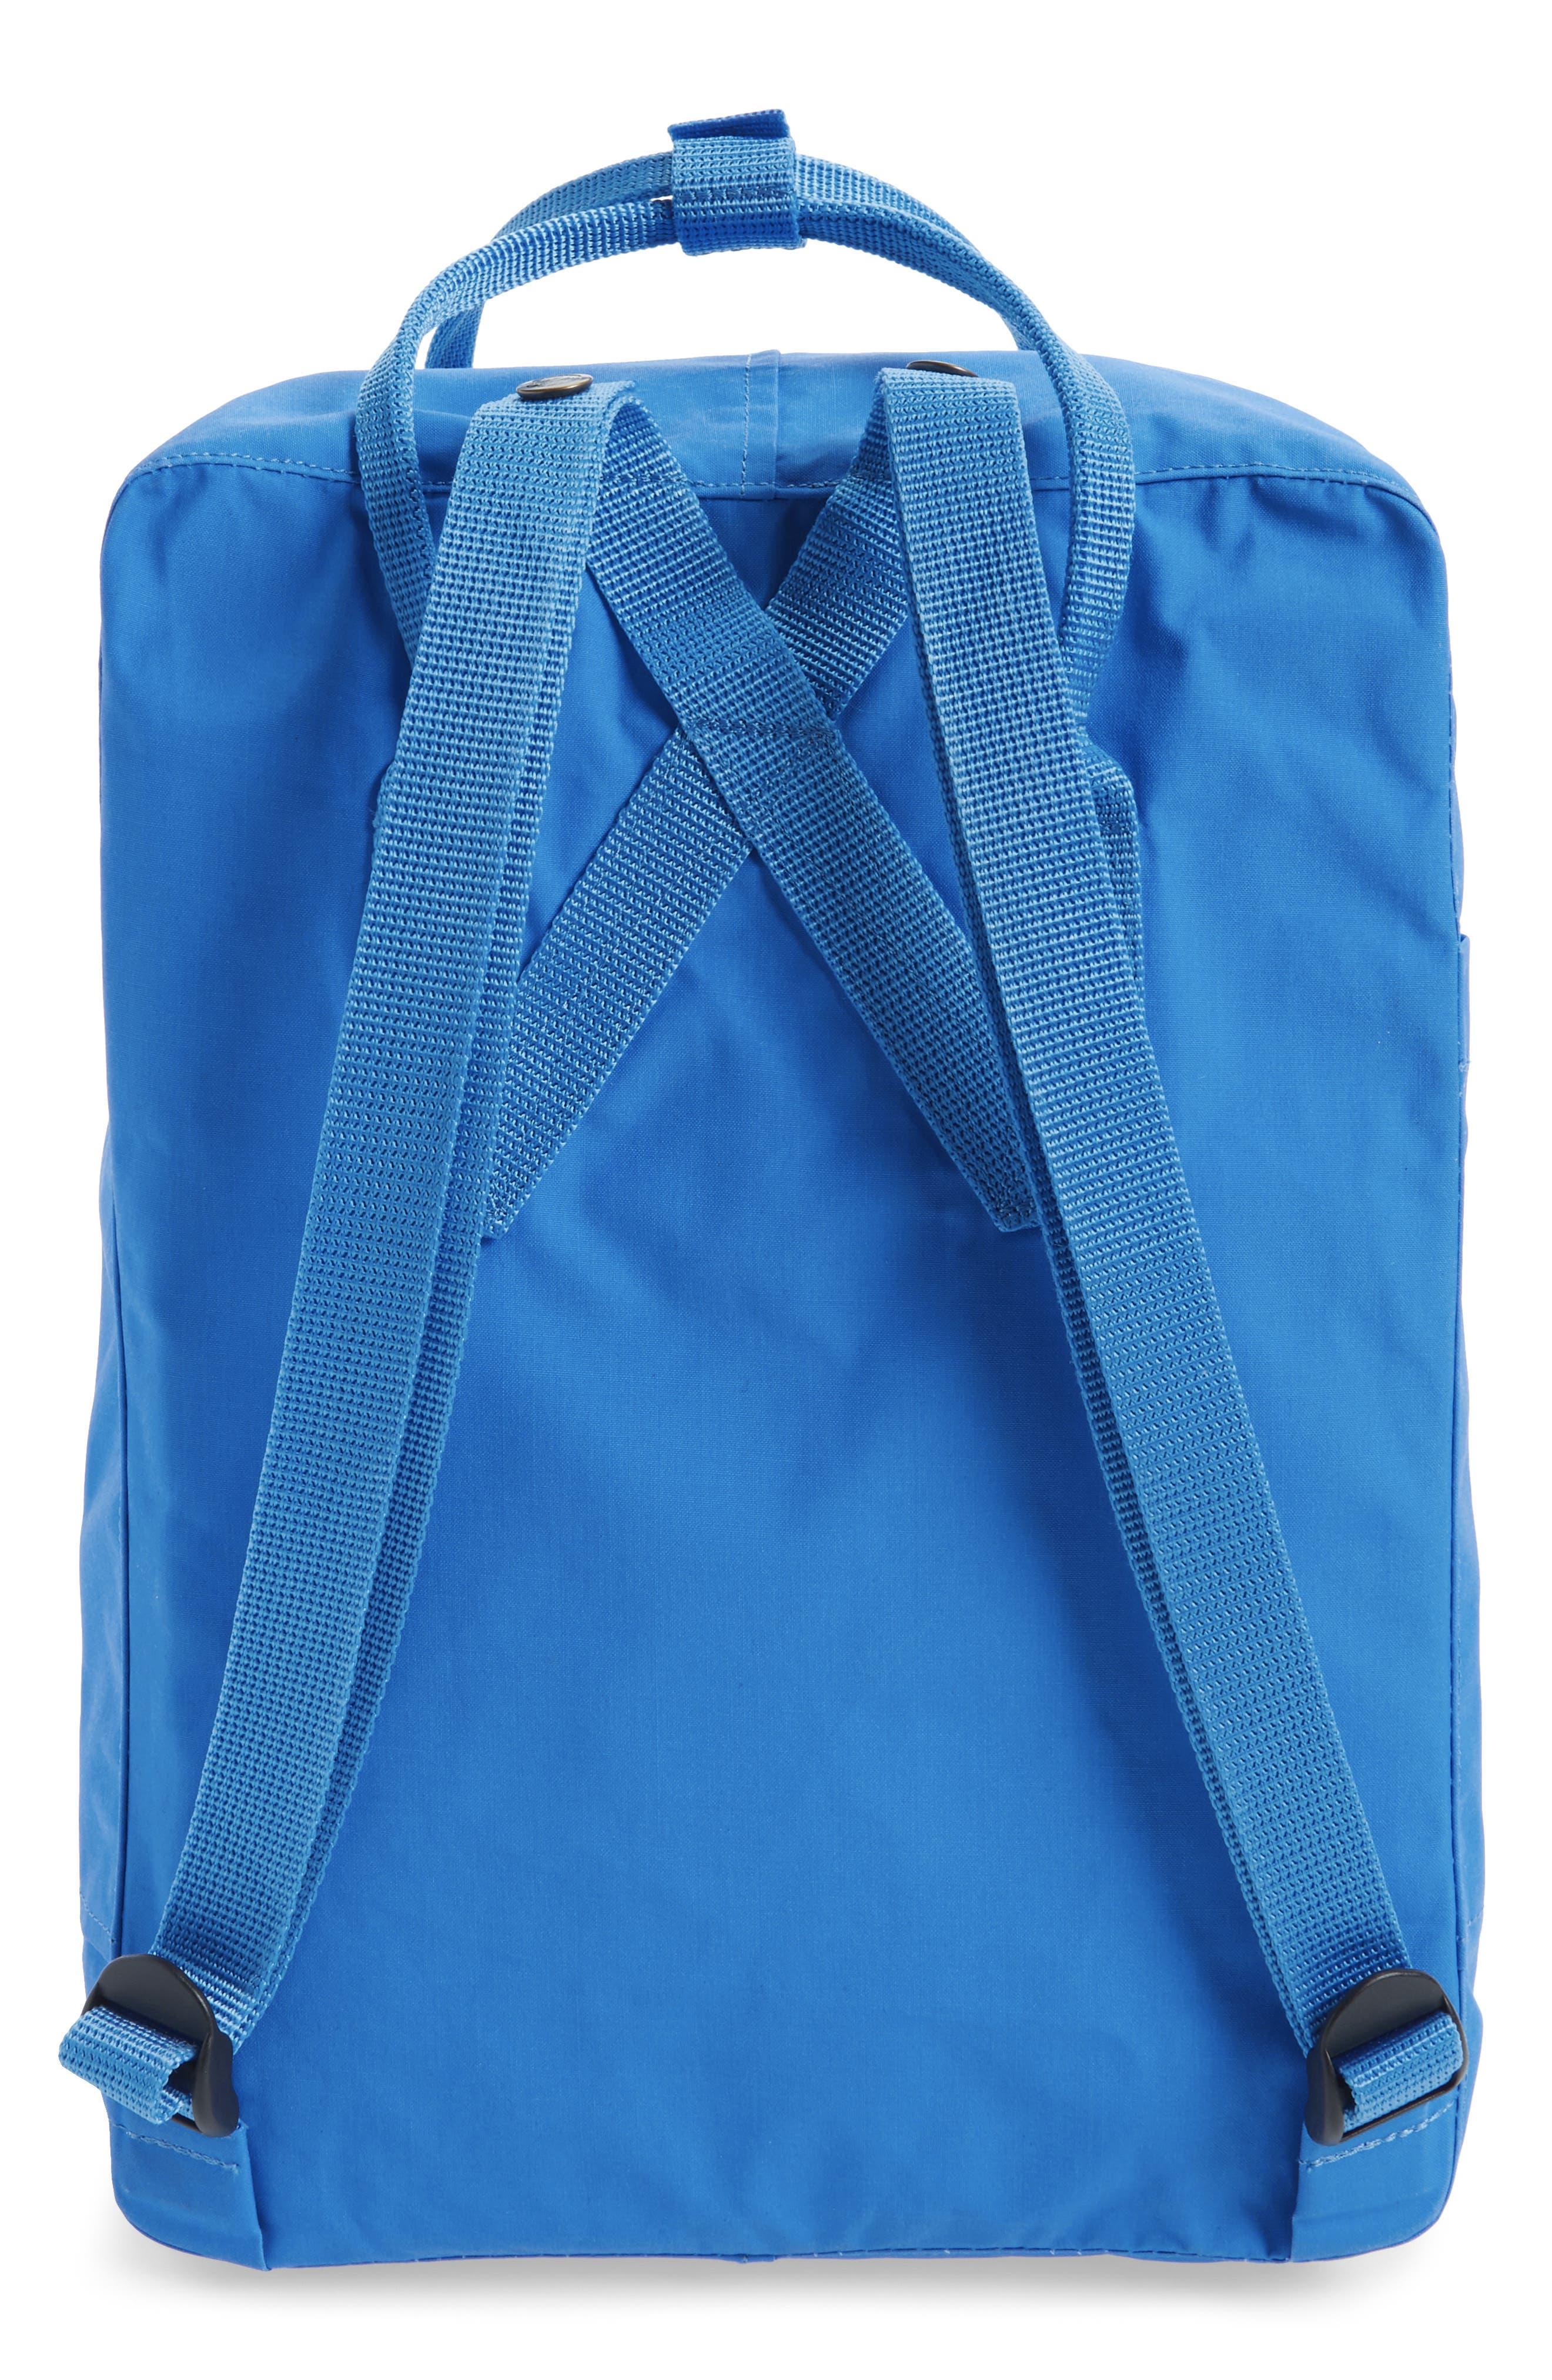 'Kånken' Water Resistant Backpack,                             Alternate thumbnail 173, color,